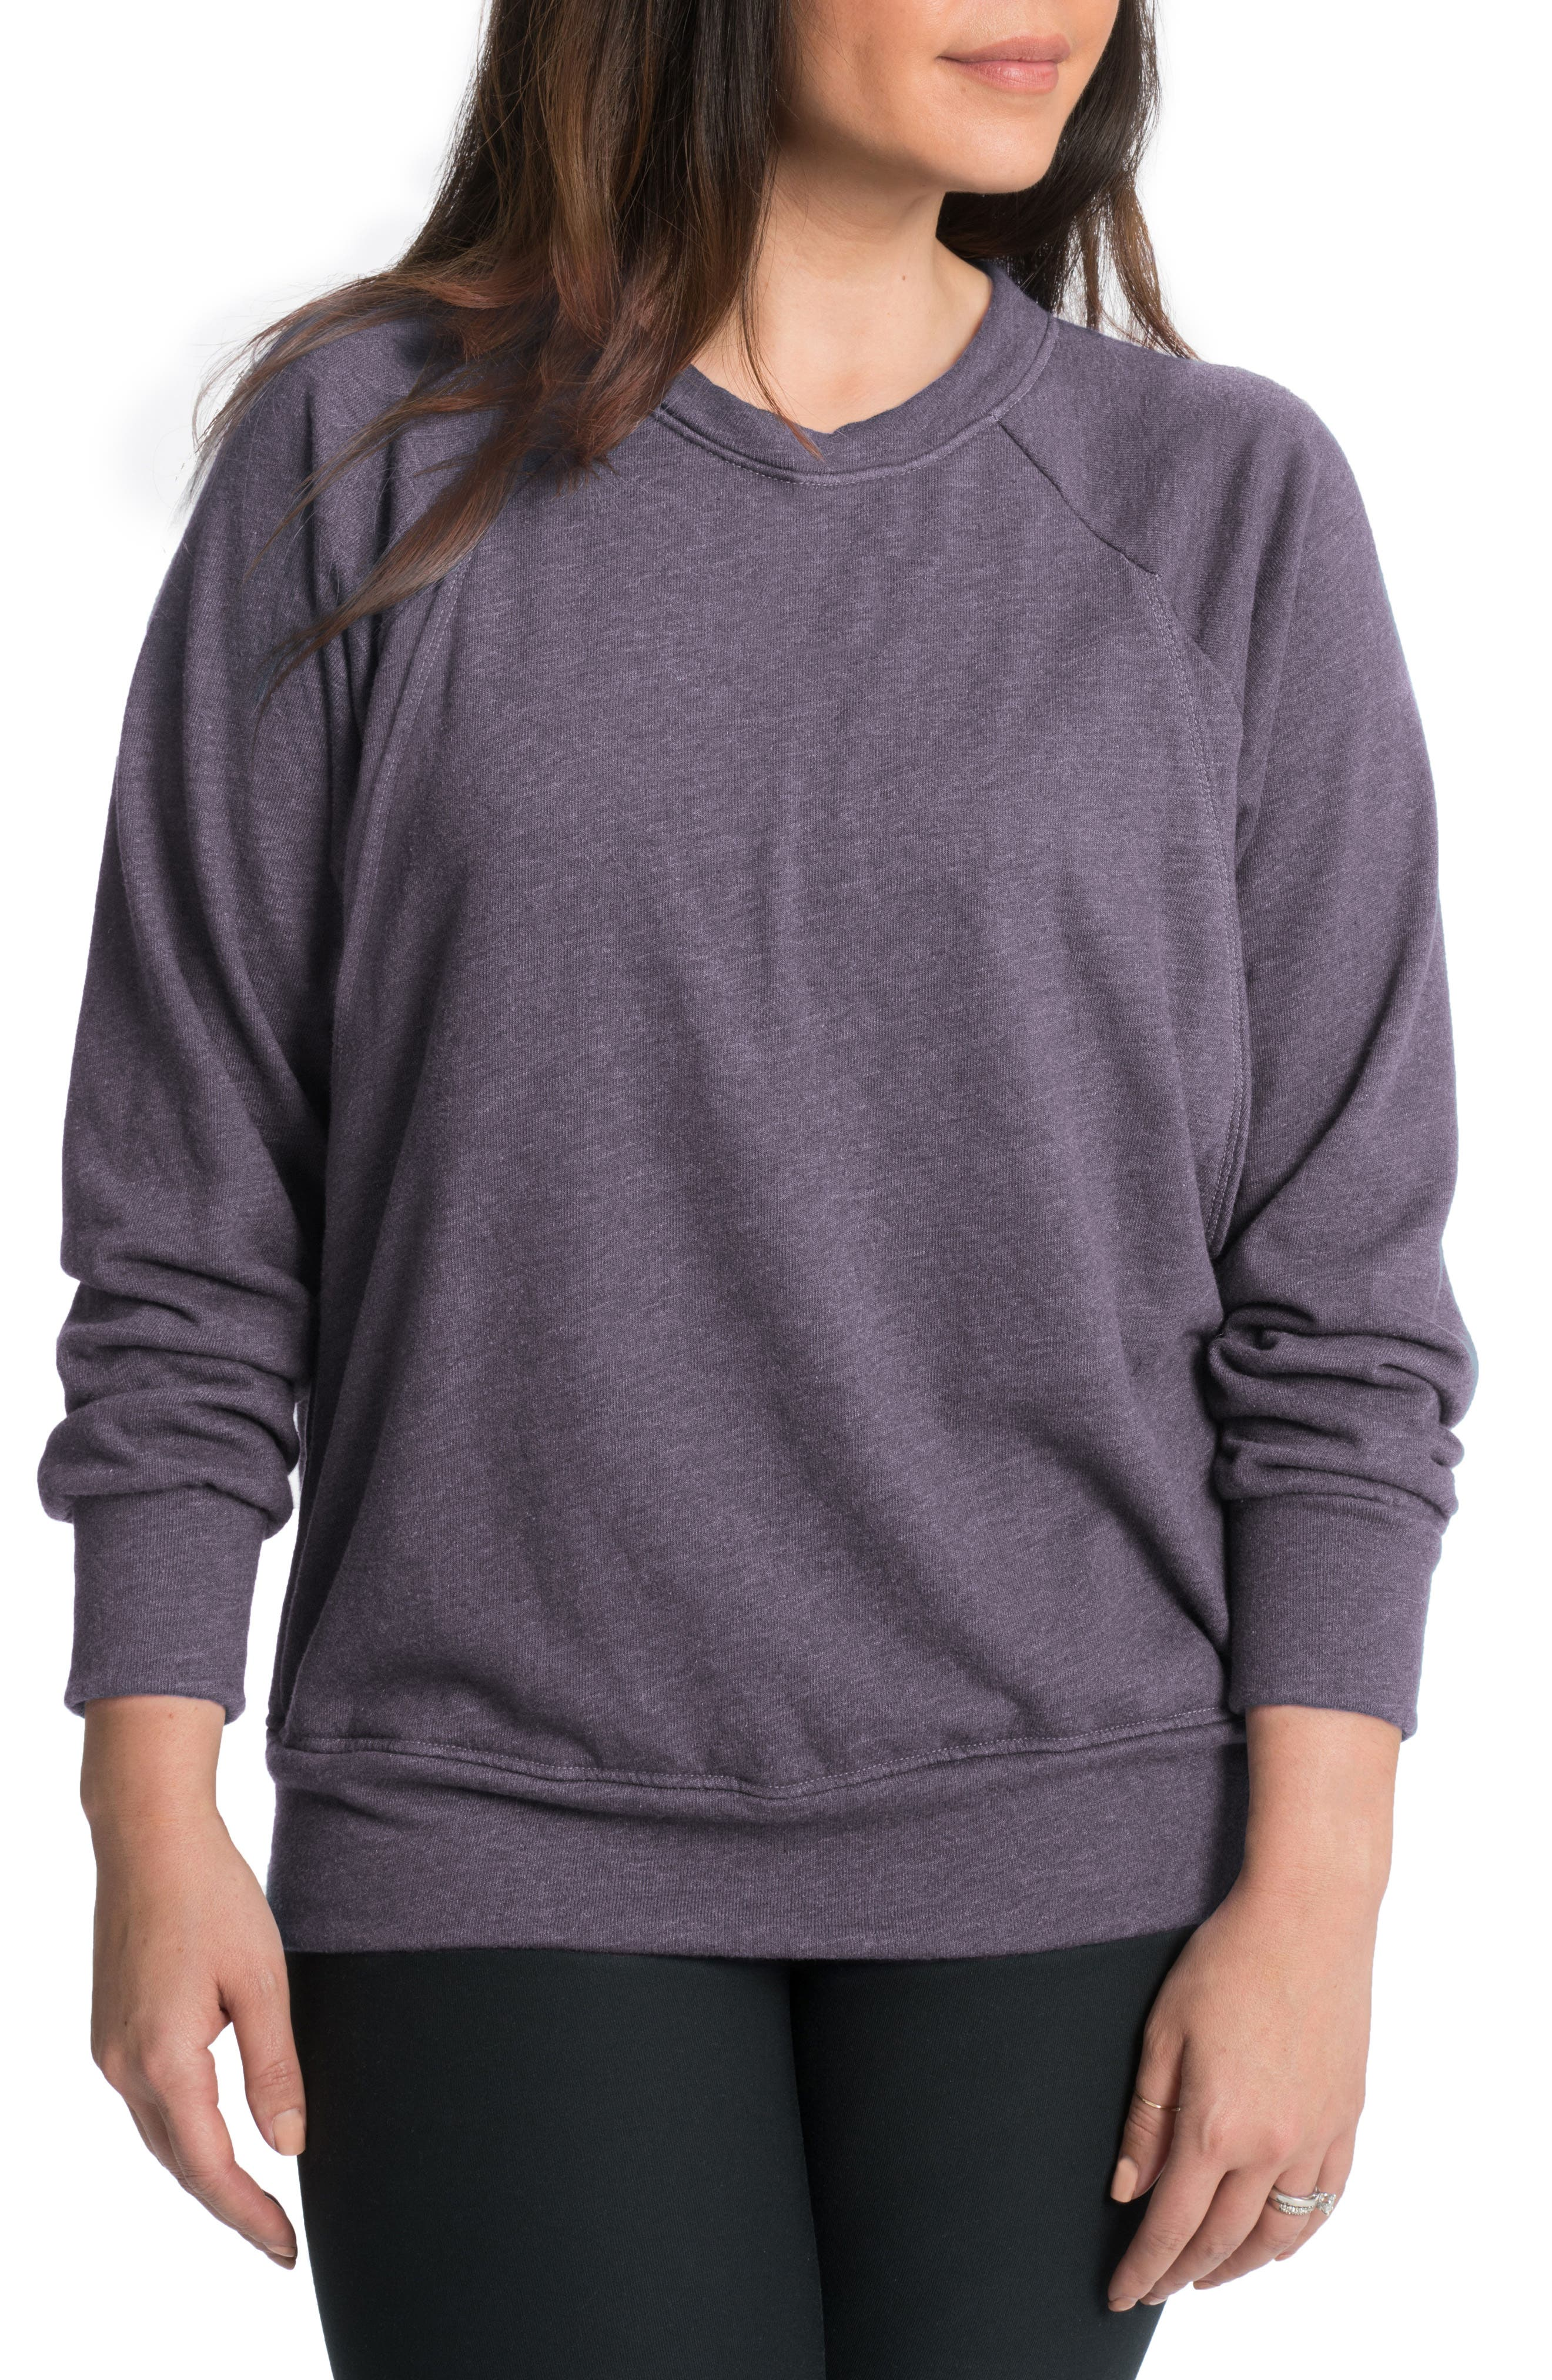 Bun Maternity Relaxed Daily Maternity/nursing Sweatshirt, Purple